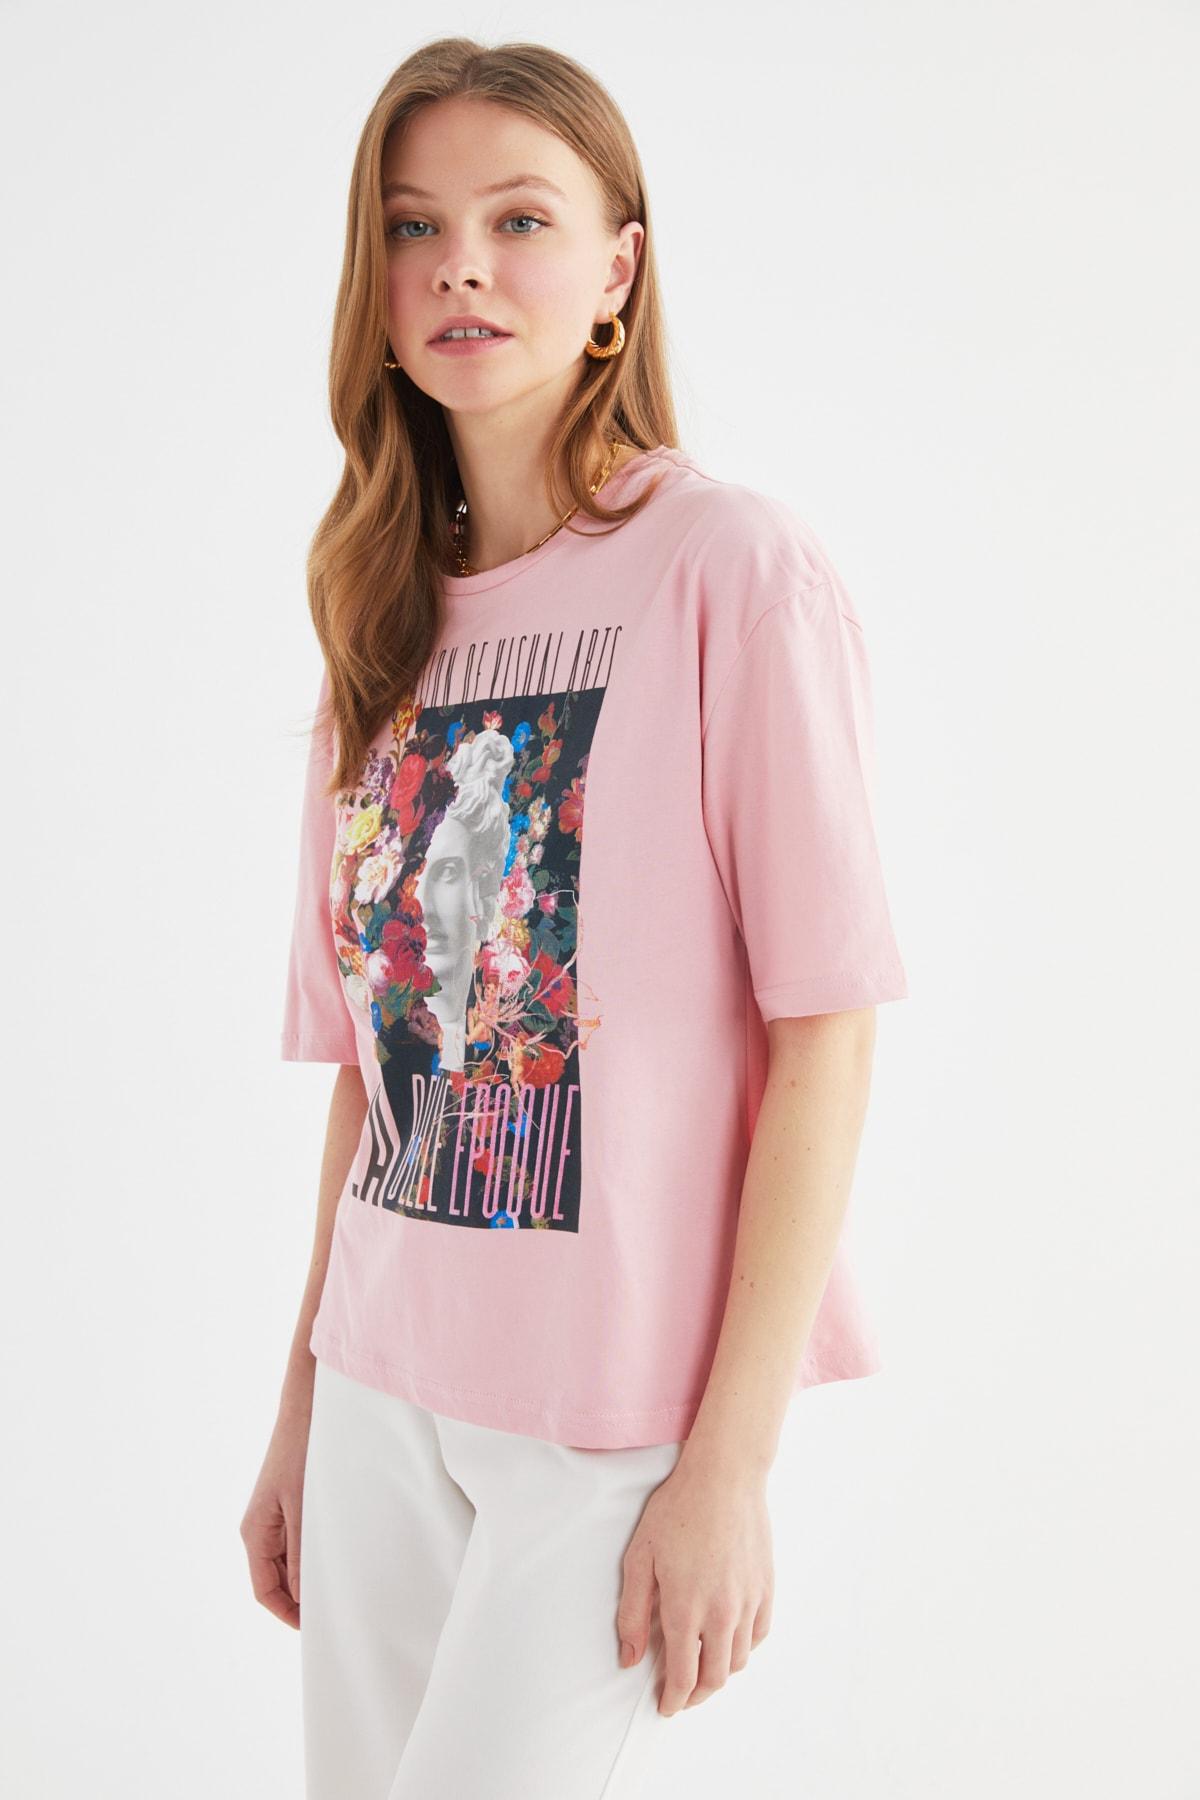 فروش انلاین تیشرت زنانه مجلسی برند ترندیول میلا رنگ صورتی ty99685619